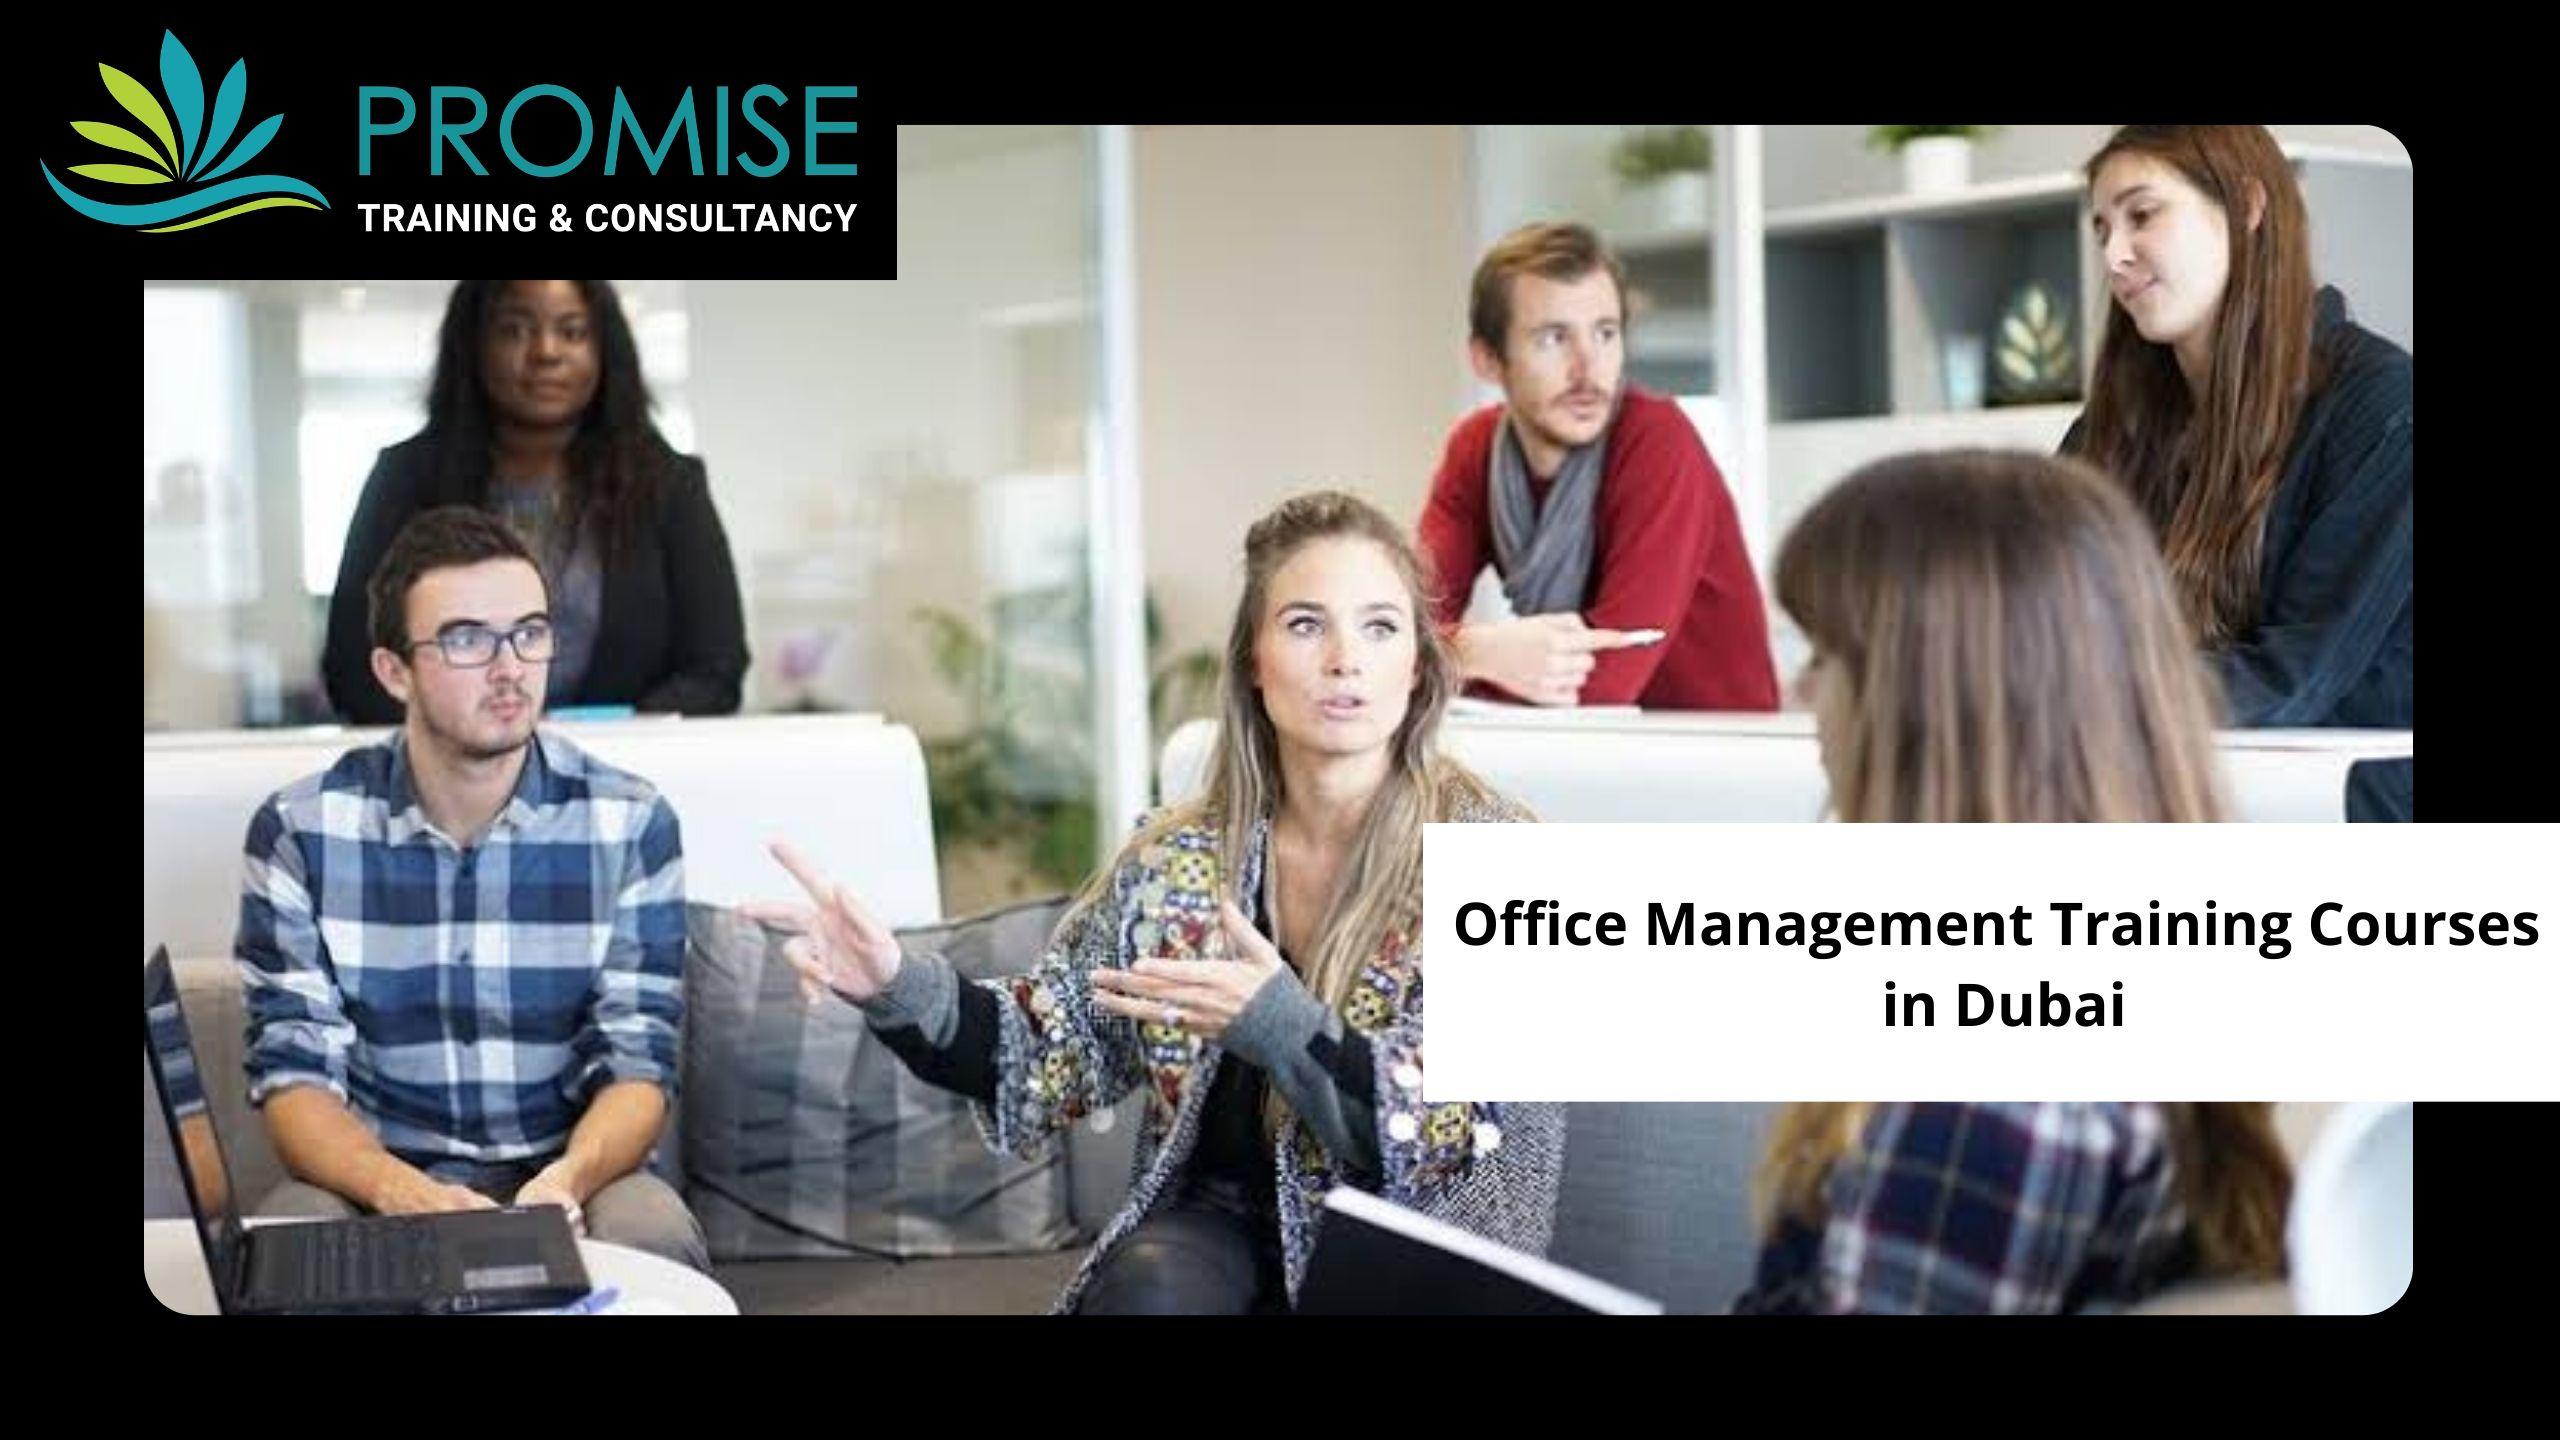 Office Management Training Courses in Dubai